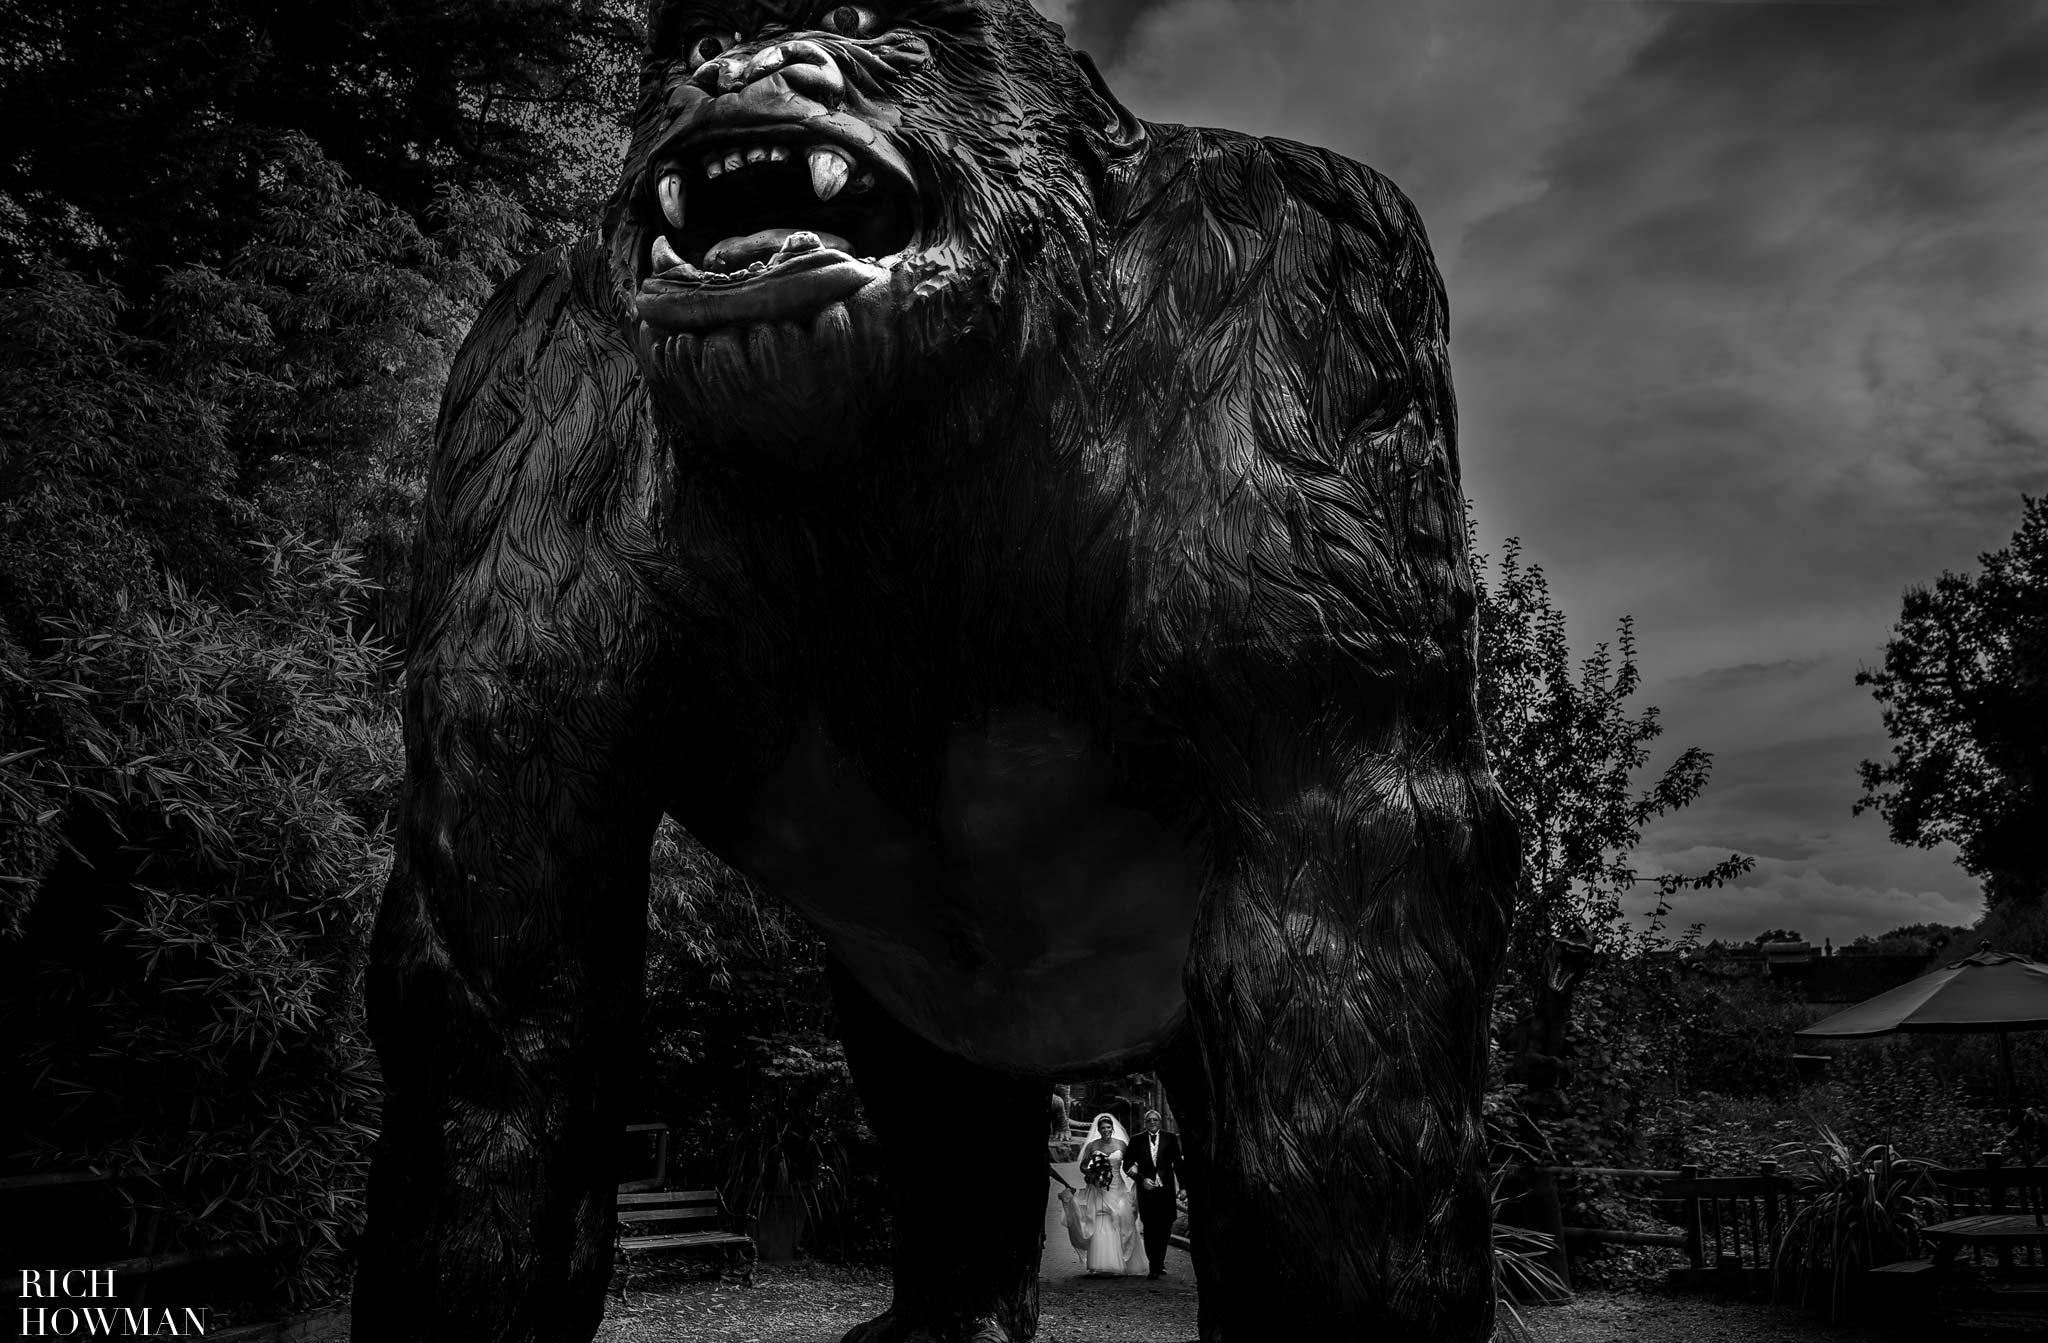 Wookey Hole Wedding. Massive Gorilla at a wedding at Wookey Hole Caves.